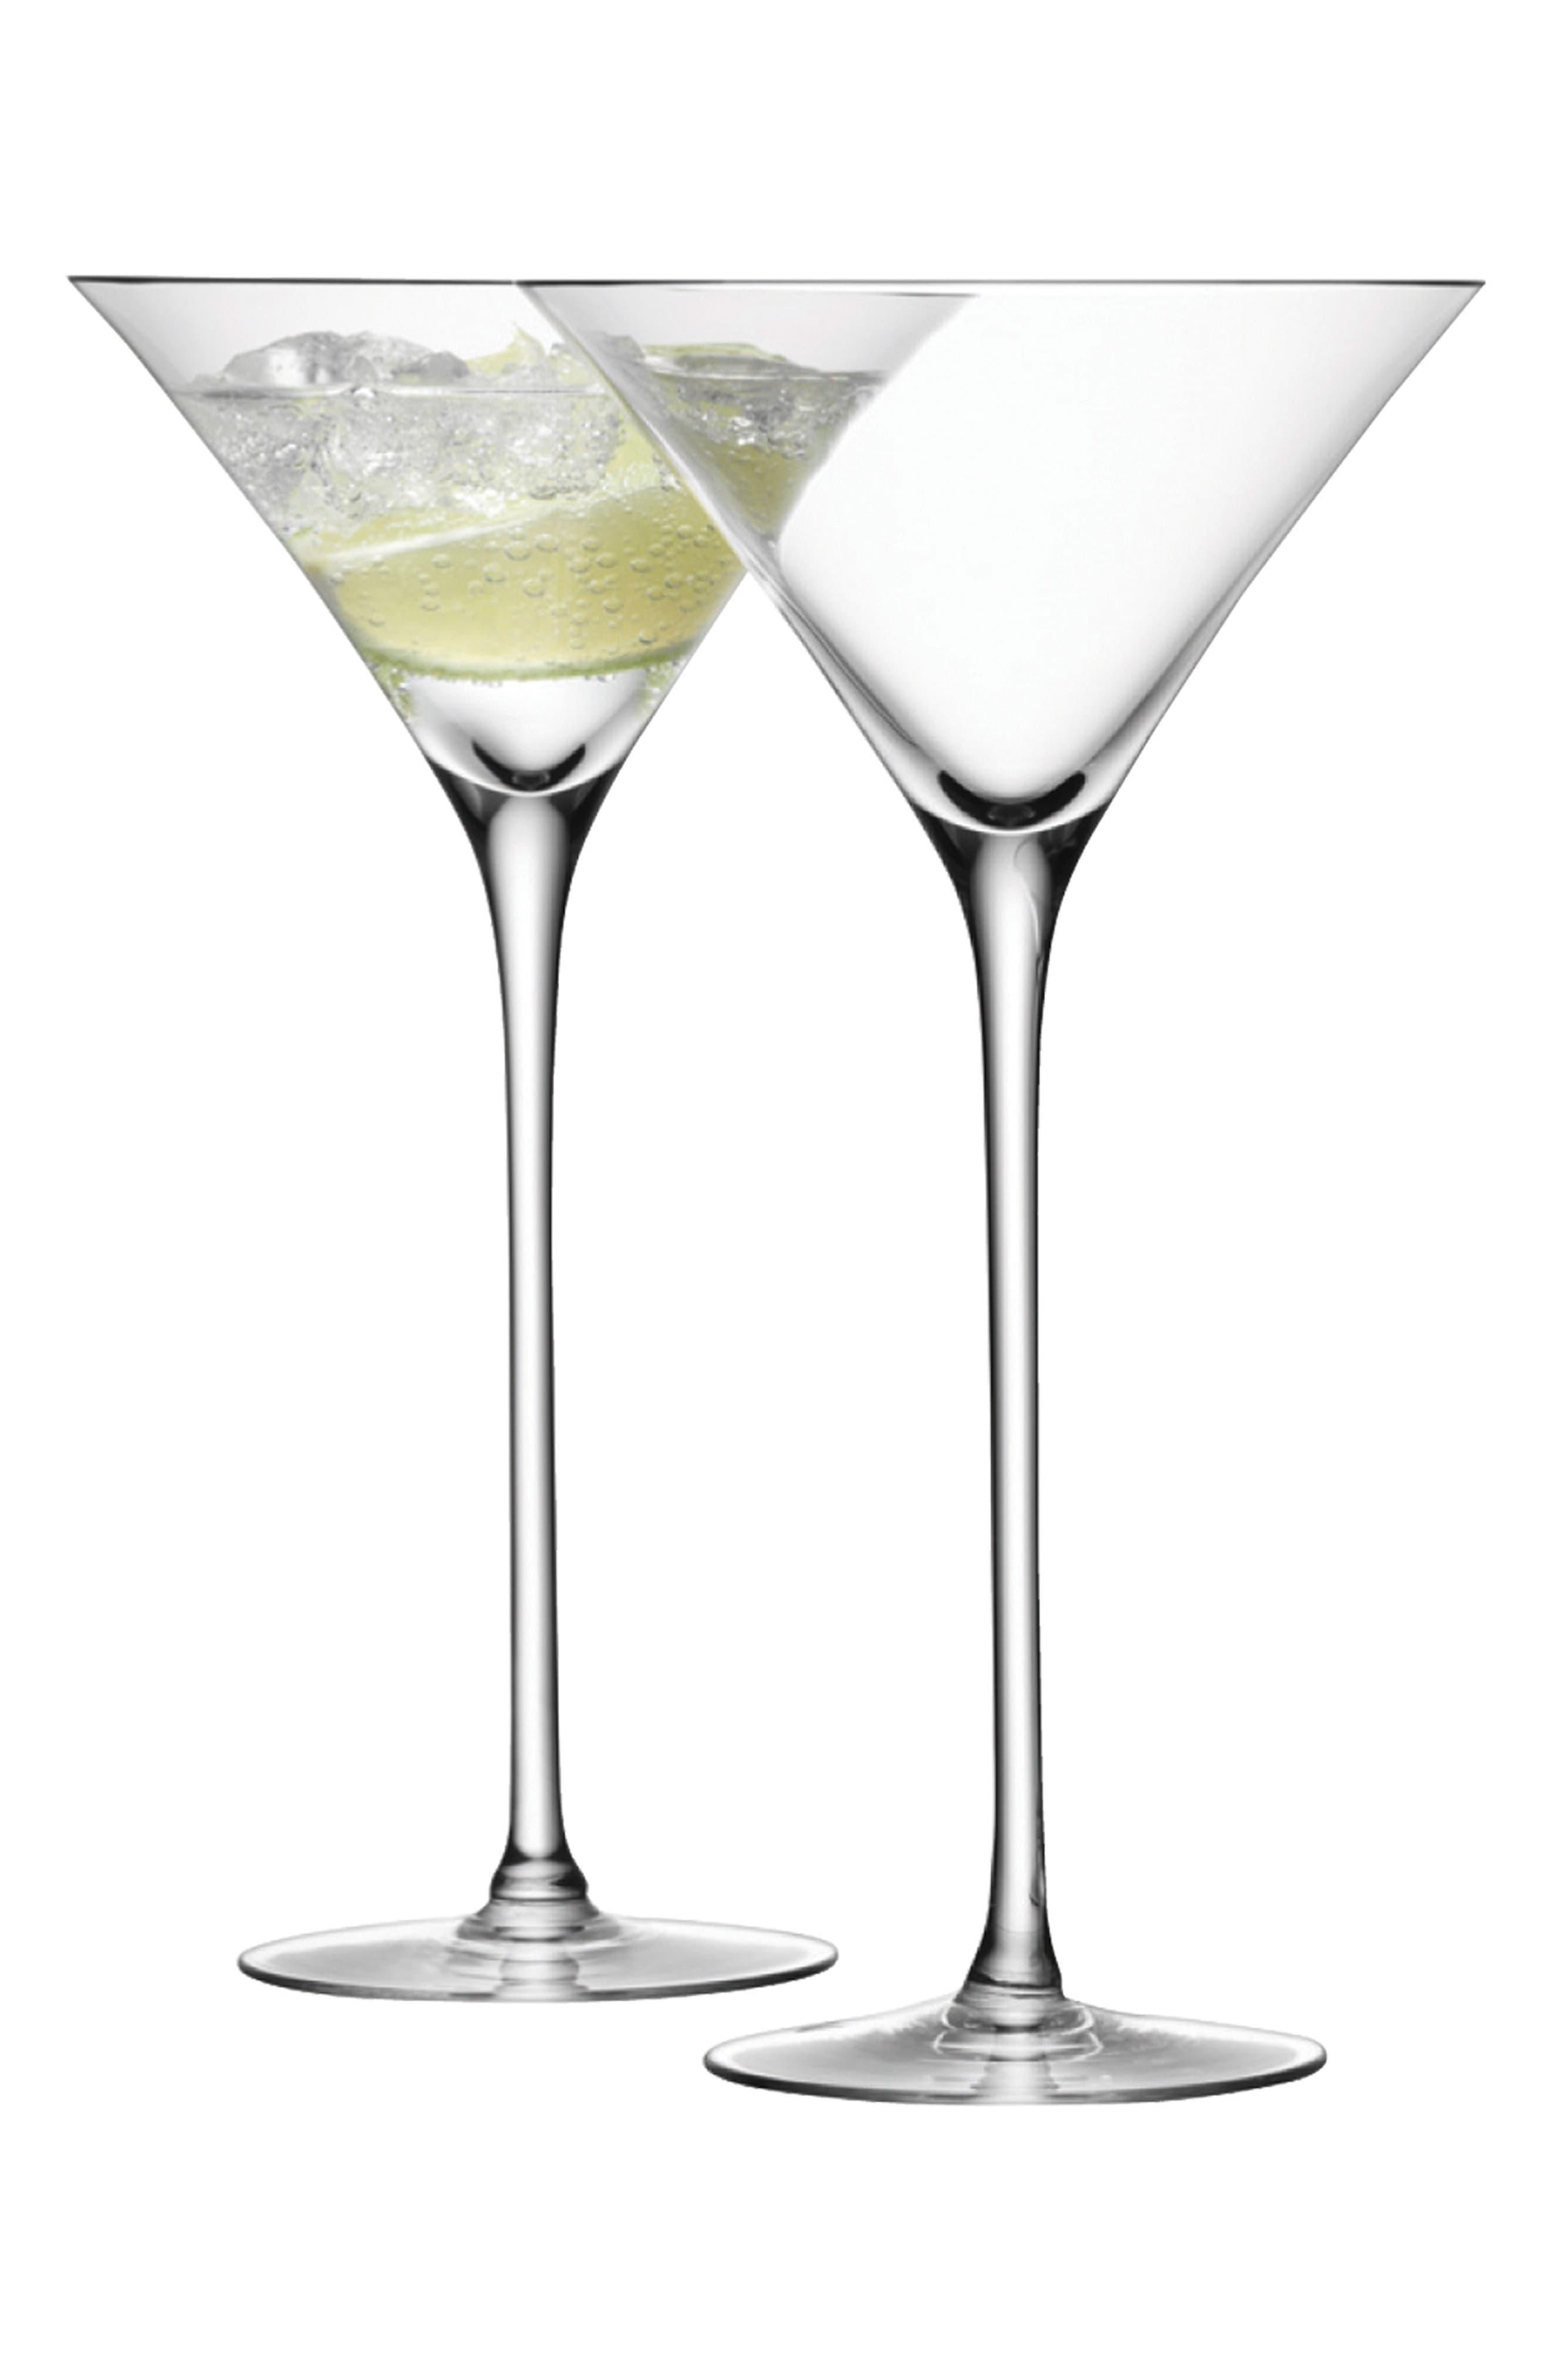 Set of 2 Bar Martini Glasses,                             Main thumbnail 1, color,                             CLEAR